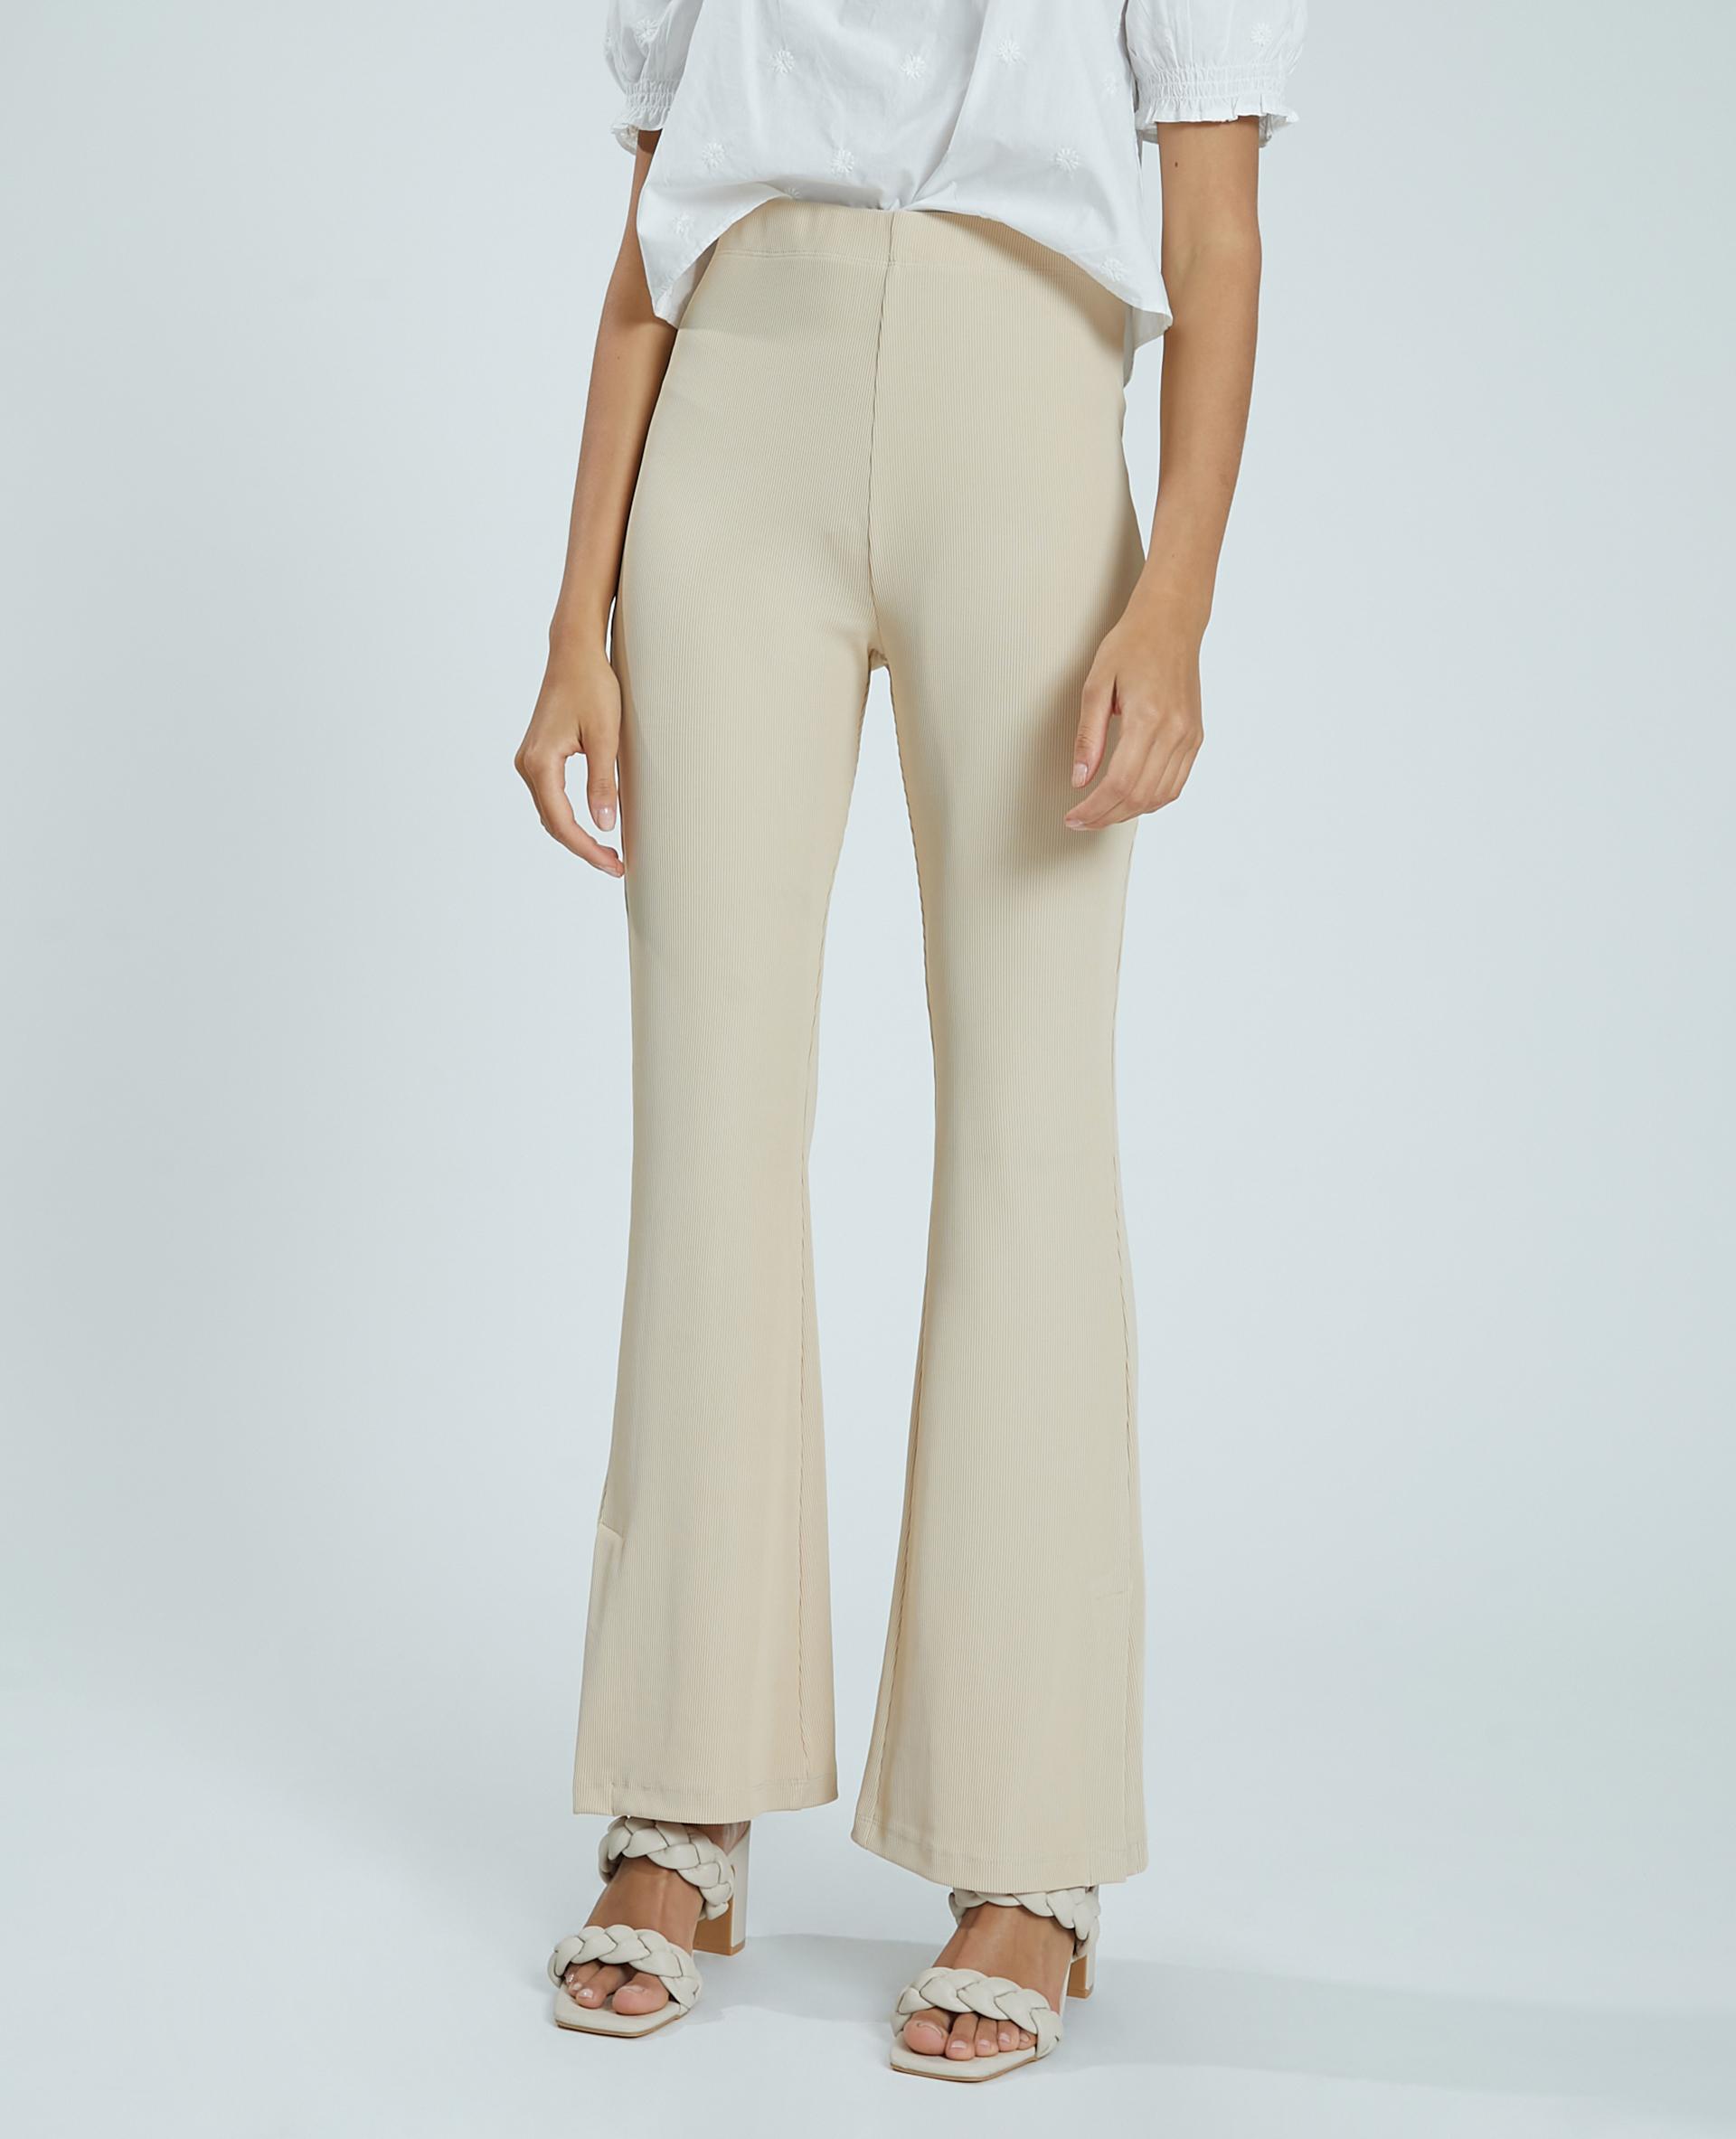 Pantalon flare beige - Pimkie